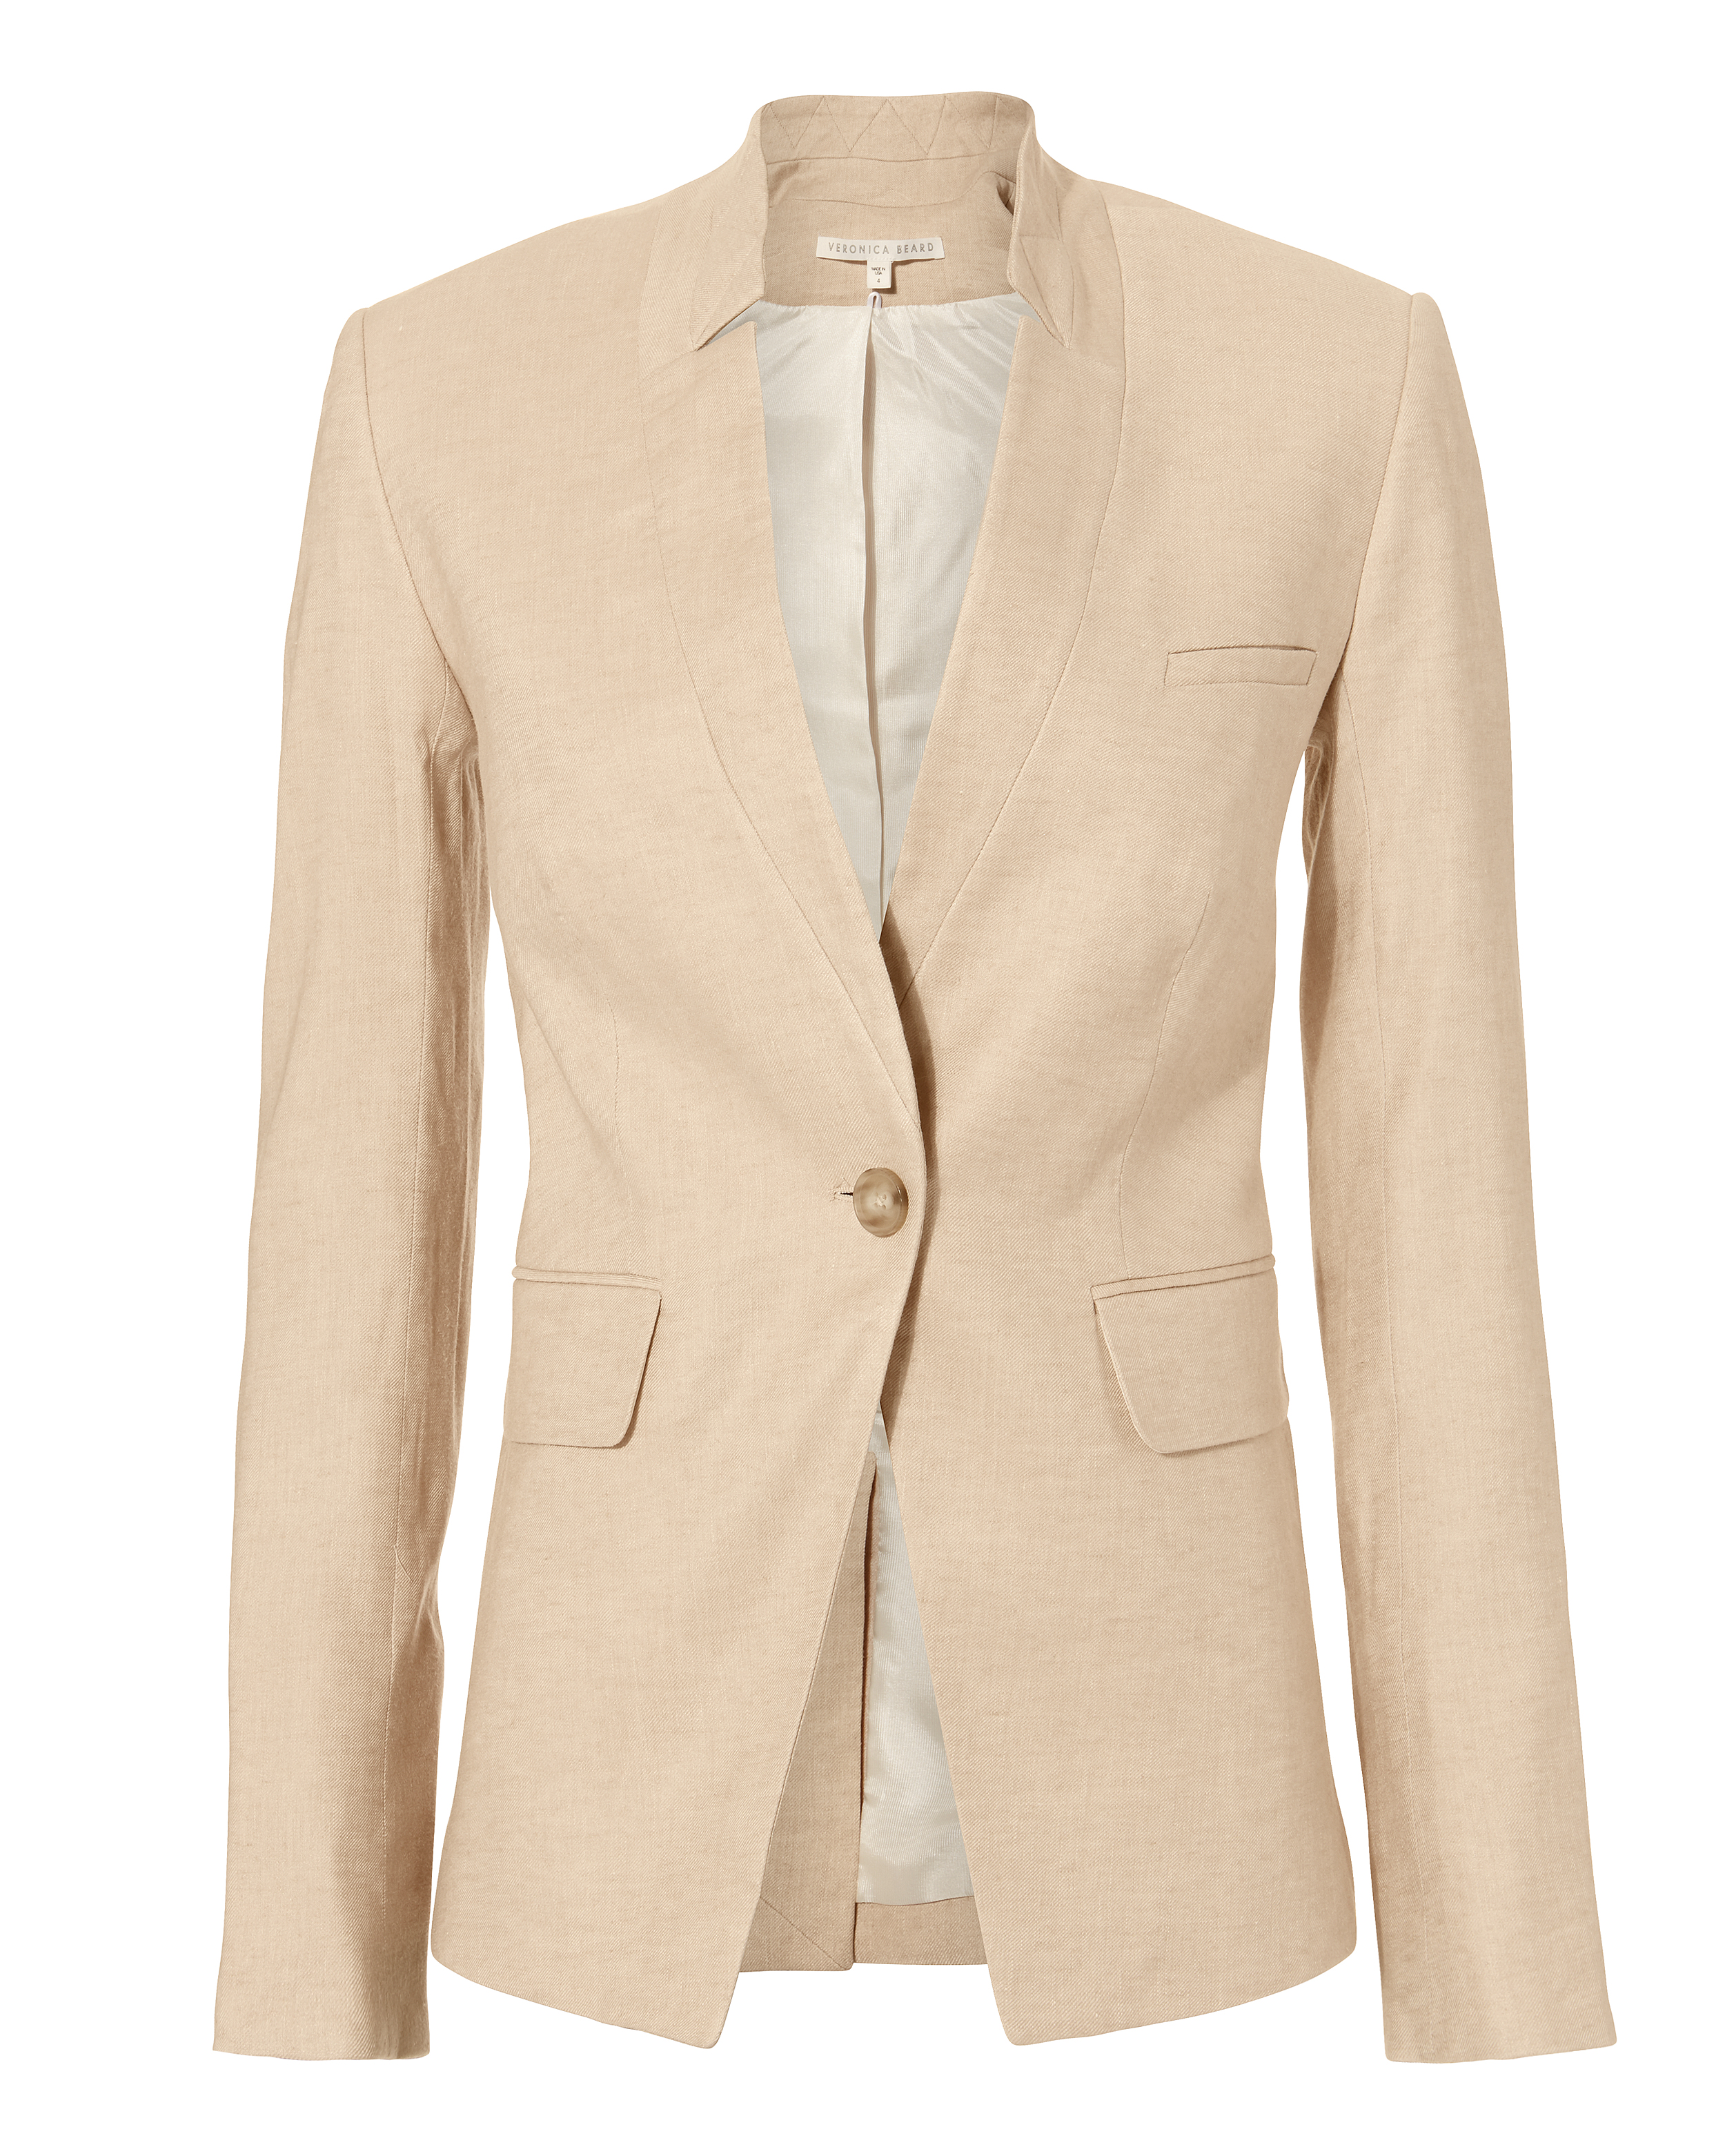 Veronica Beard Anouka Linen-blend Twill Vest In Khaki